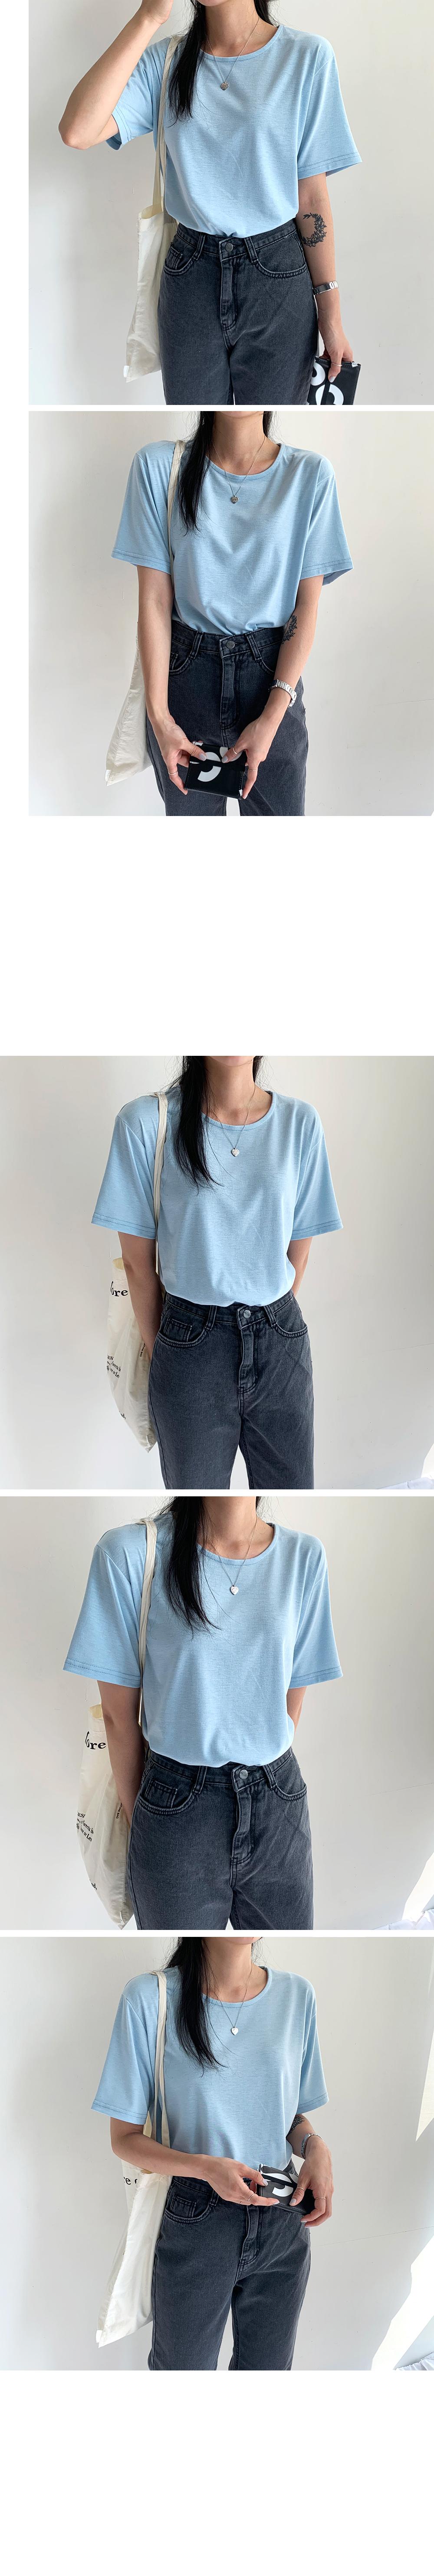 Short-sleeved tee